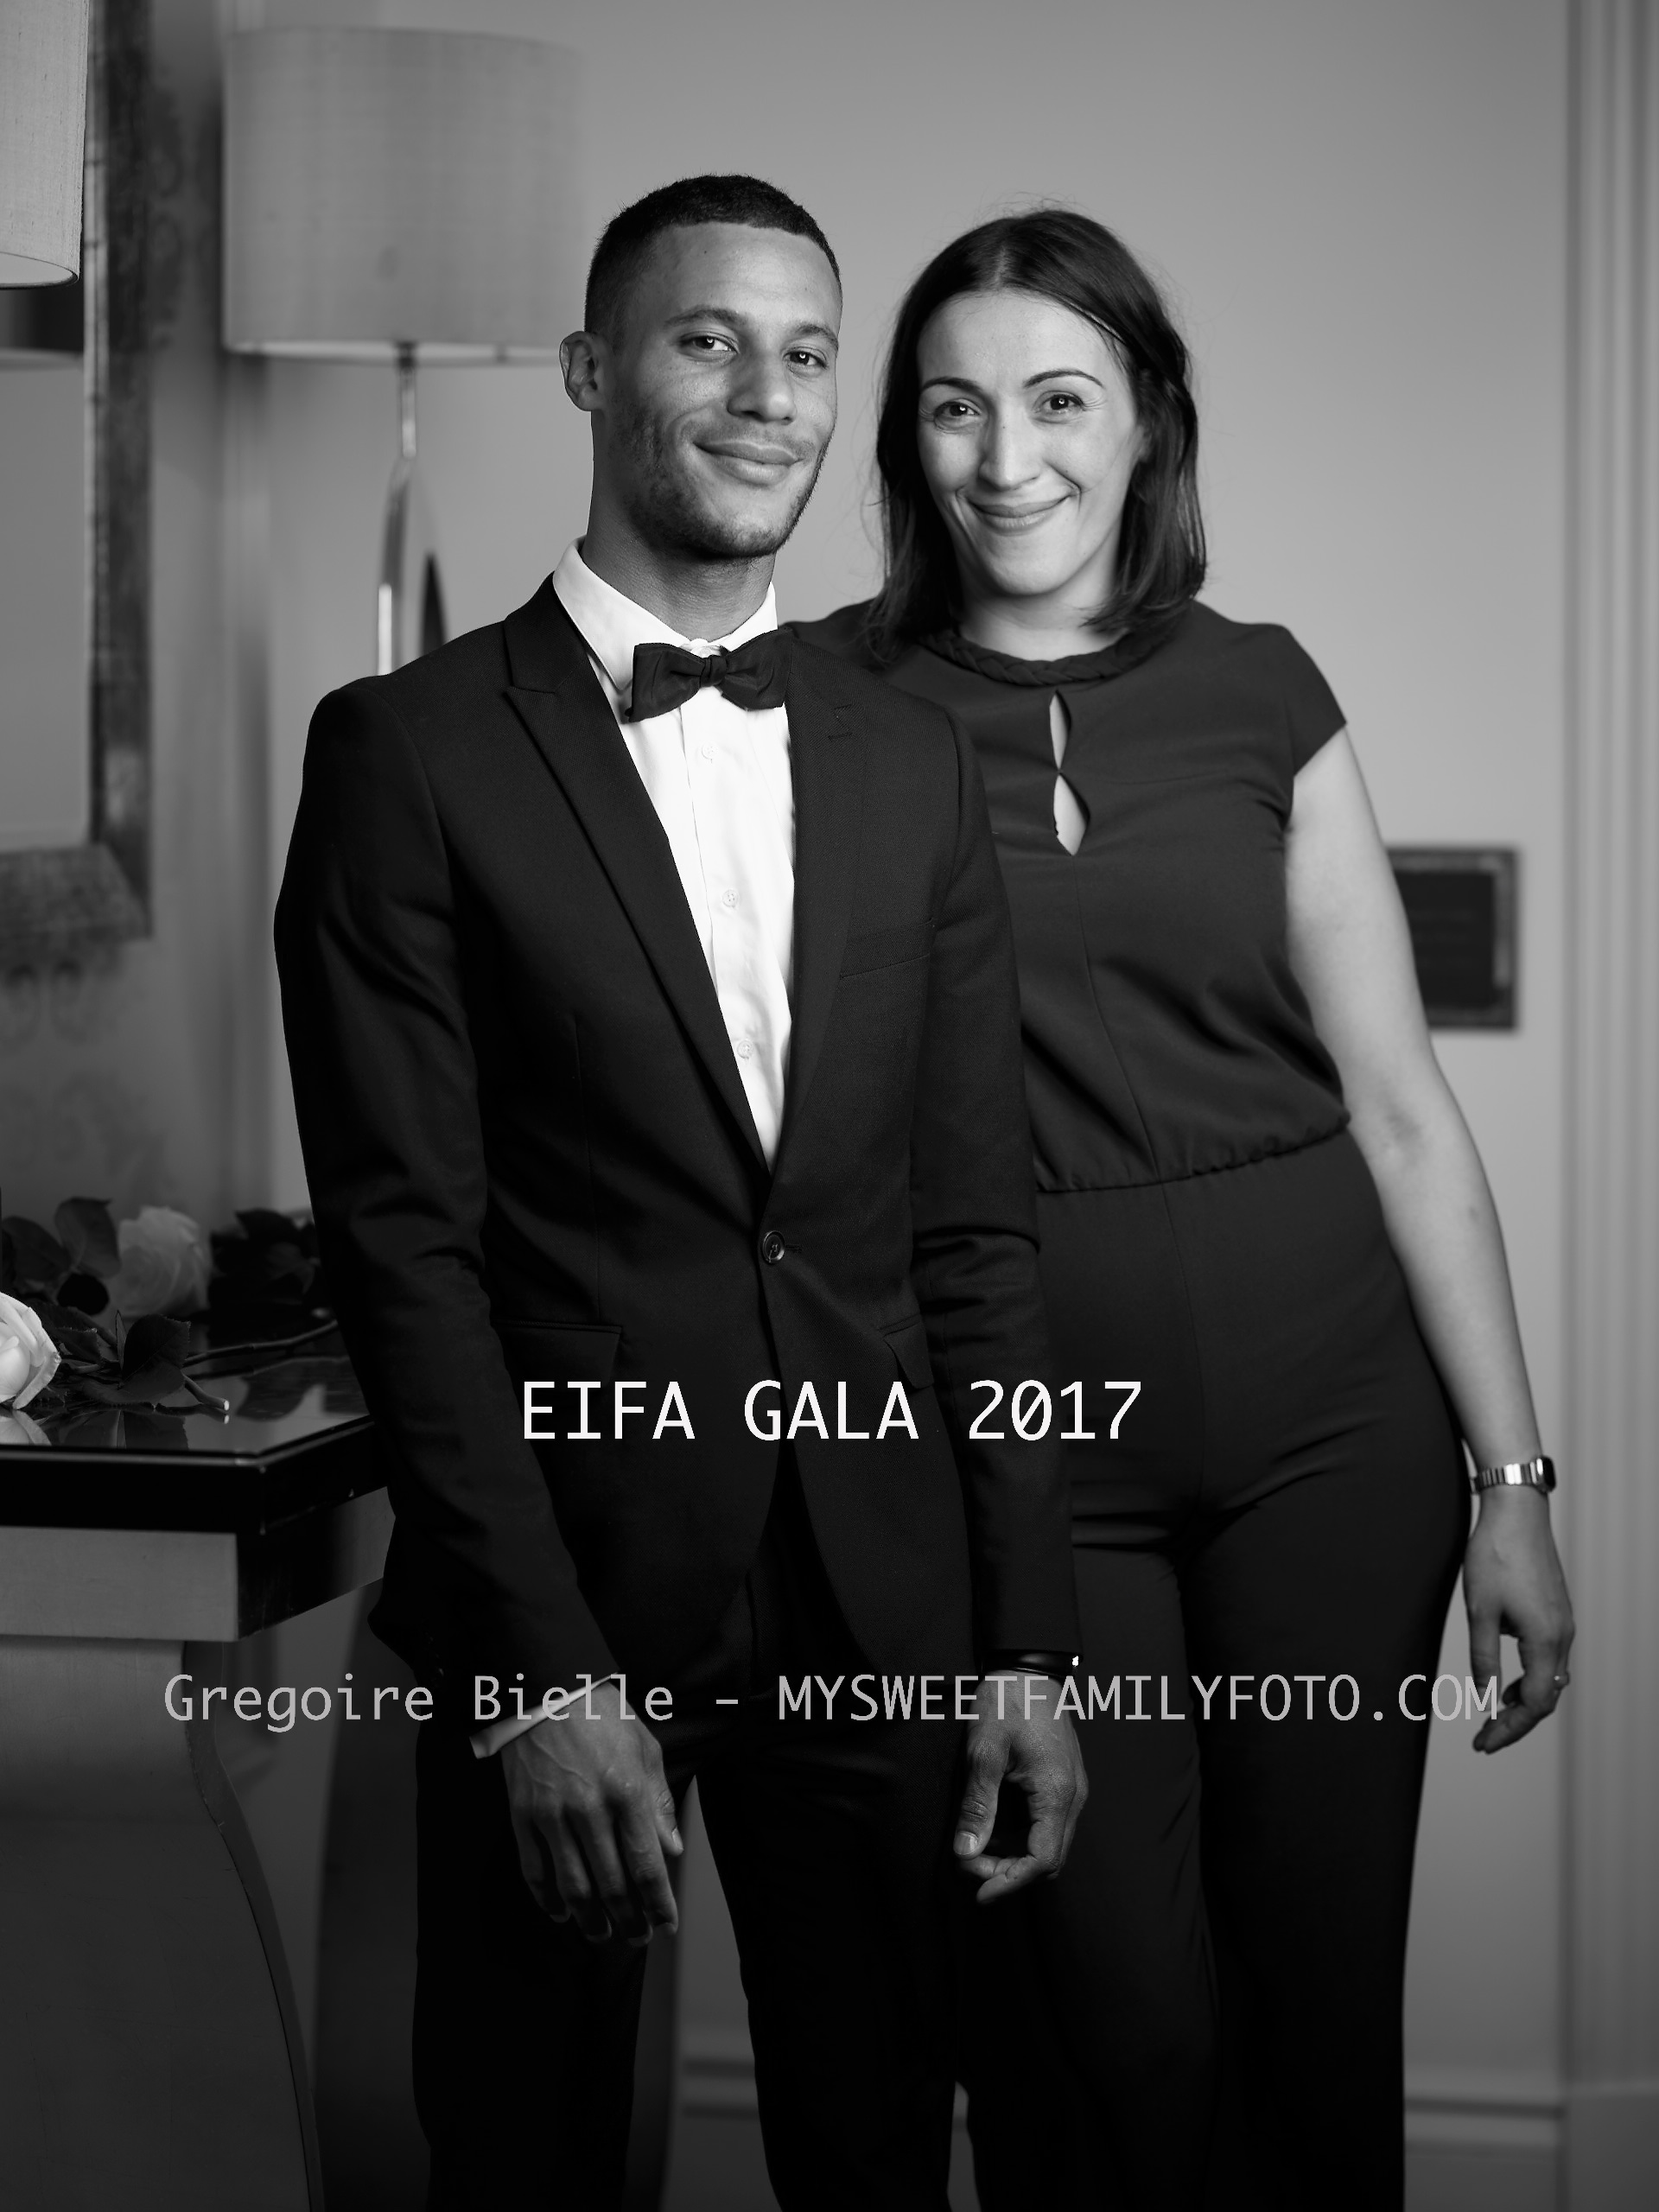 EIFA GALA 1300.jpg